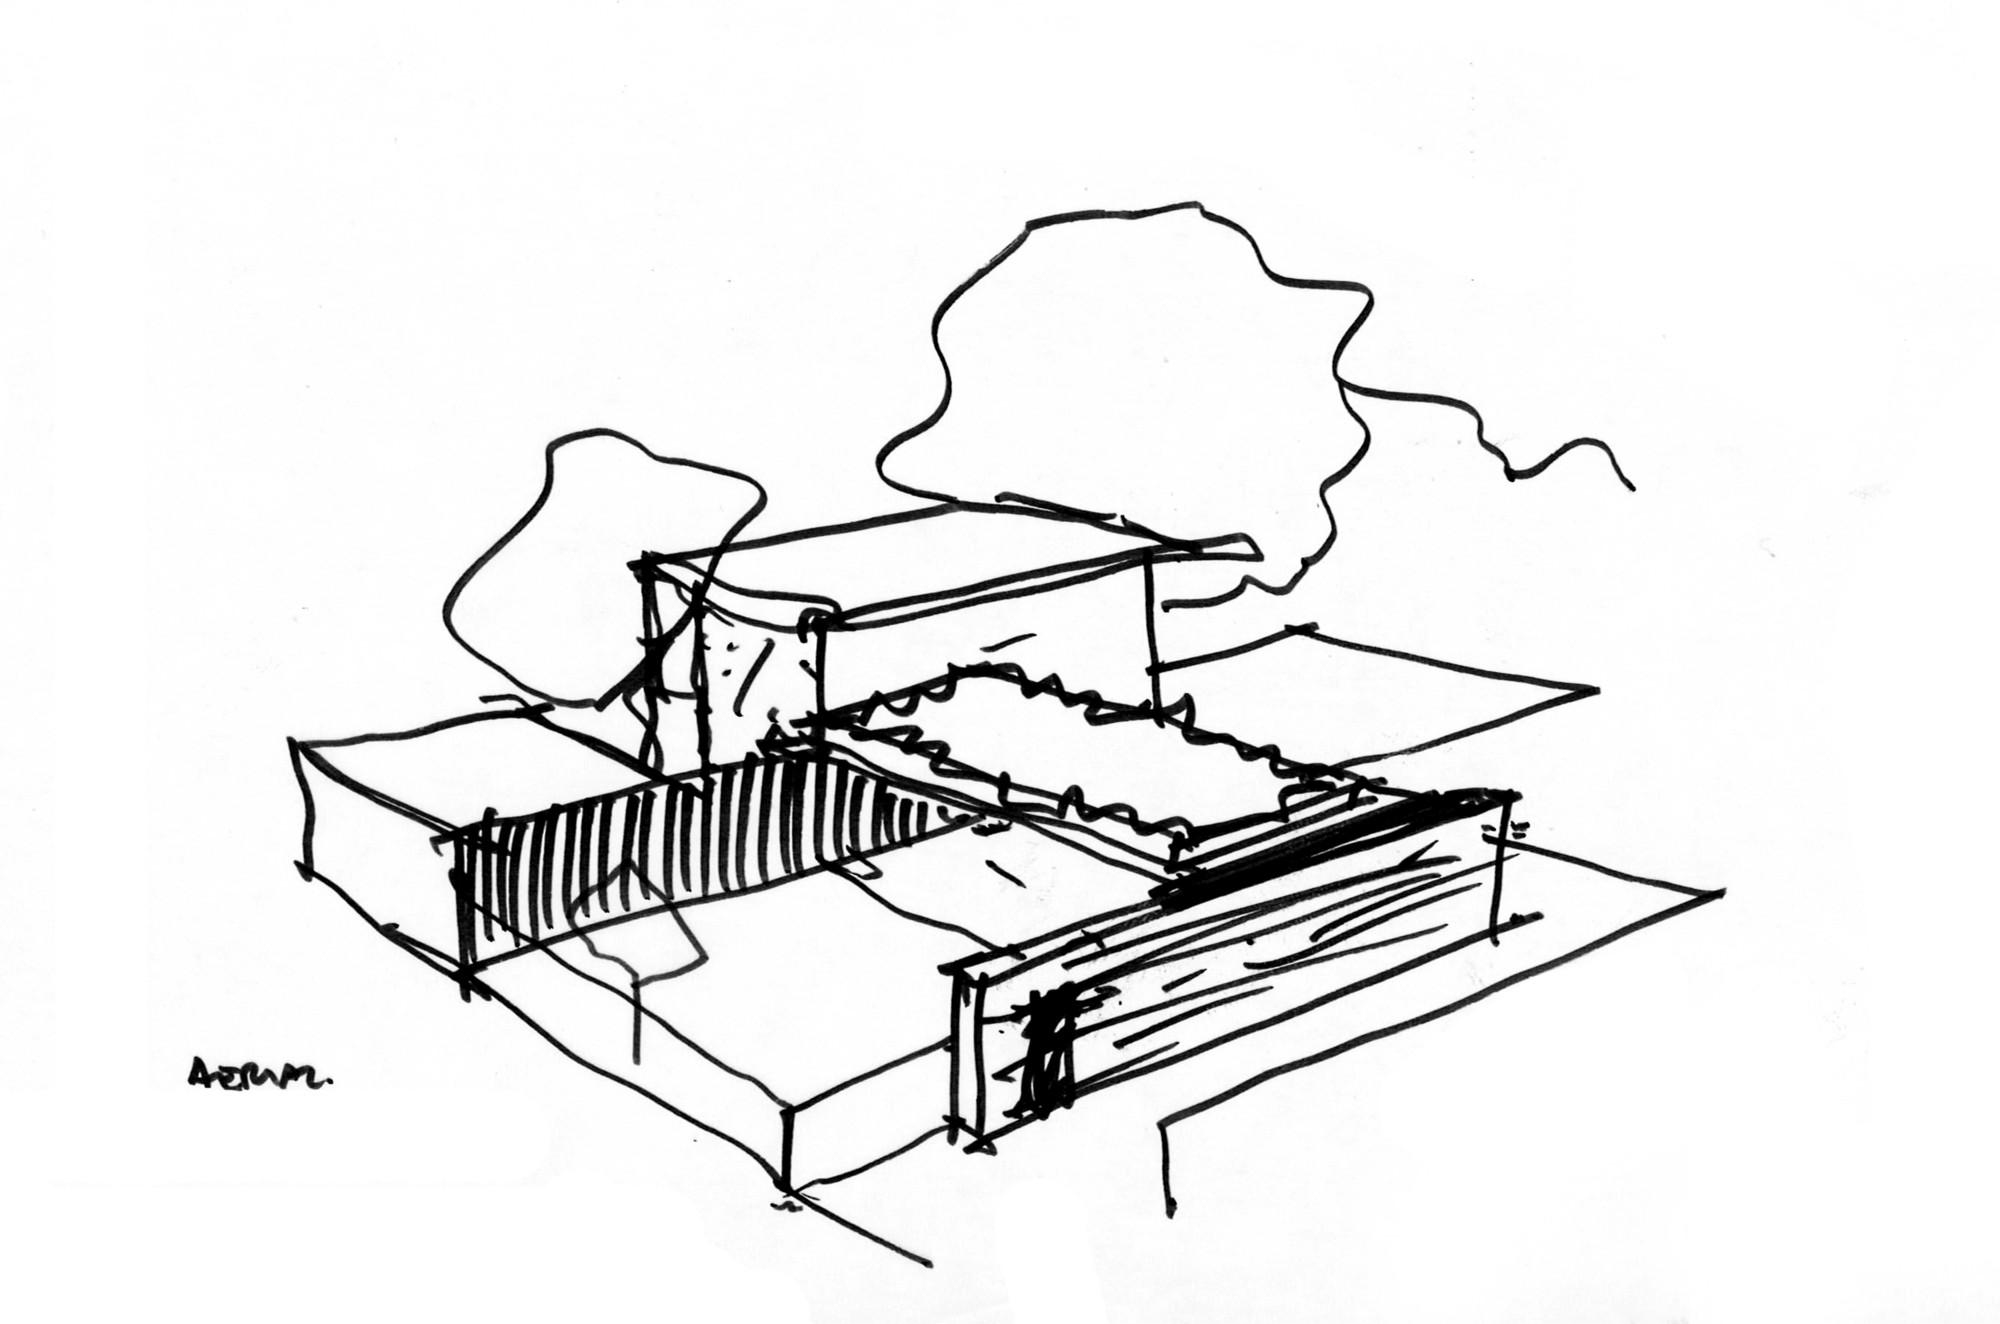 Chevy Hhr Sunroof Parts Diagrams Schematic Wiring Diagram 2003 Custom U2022 Manual